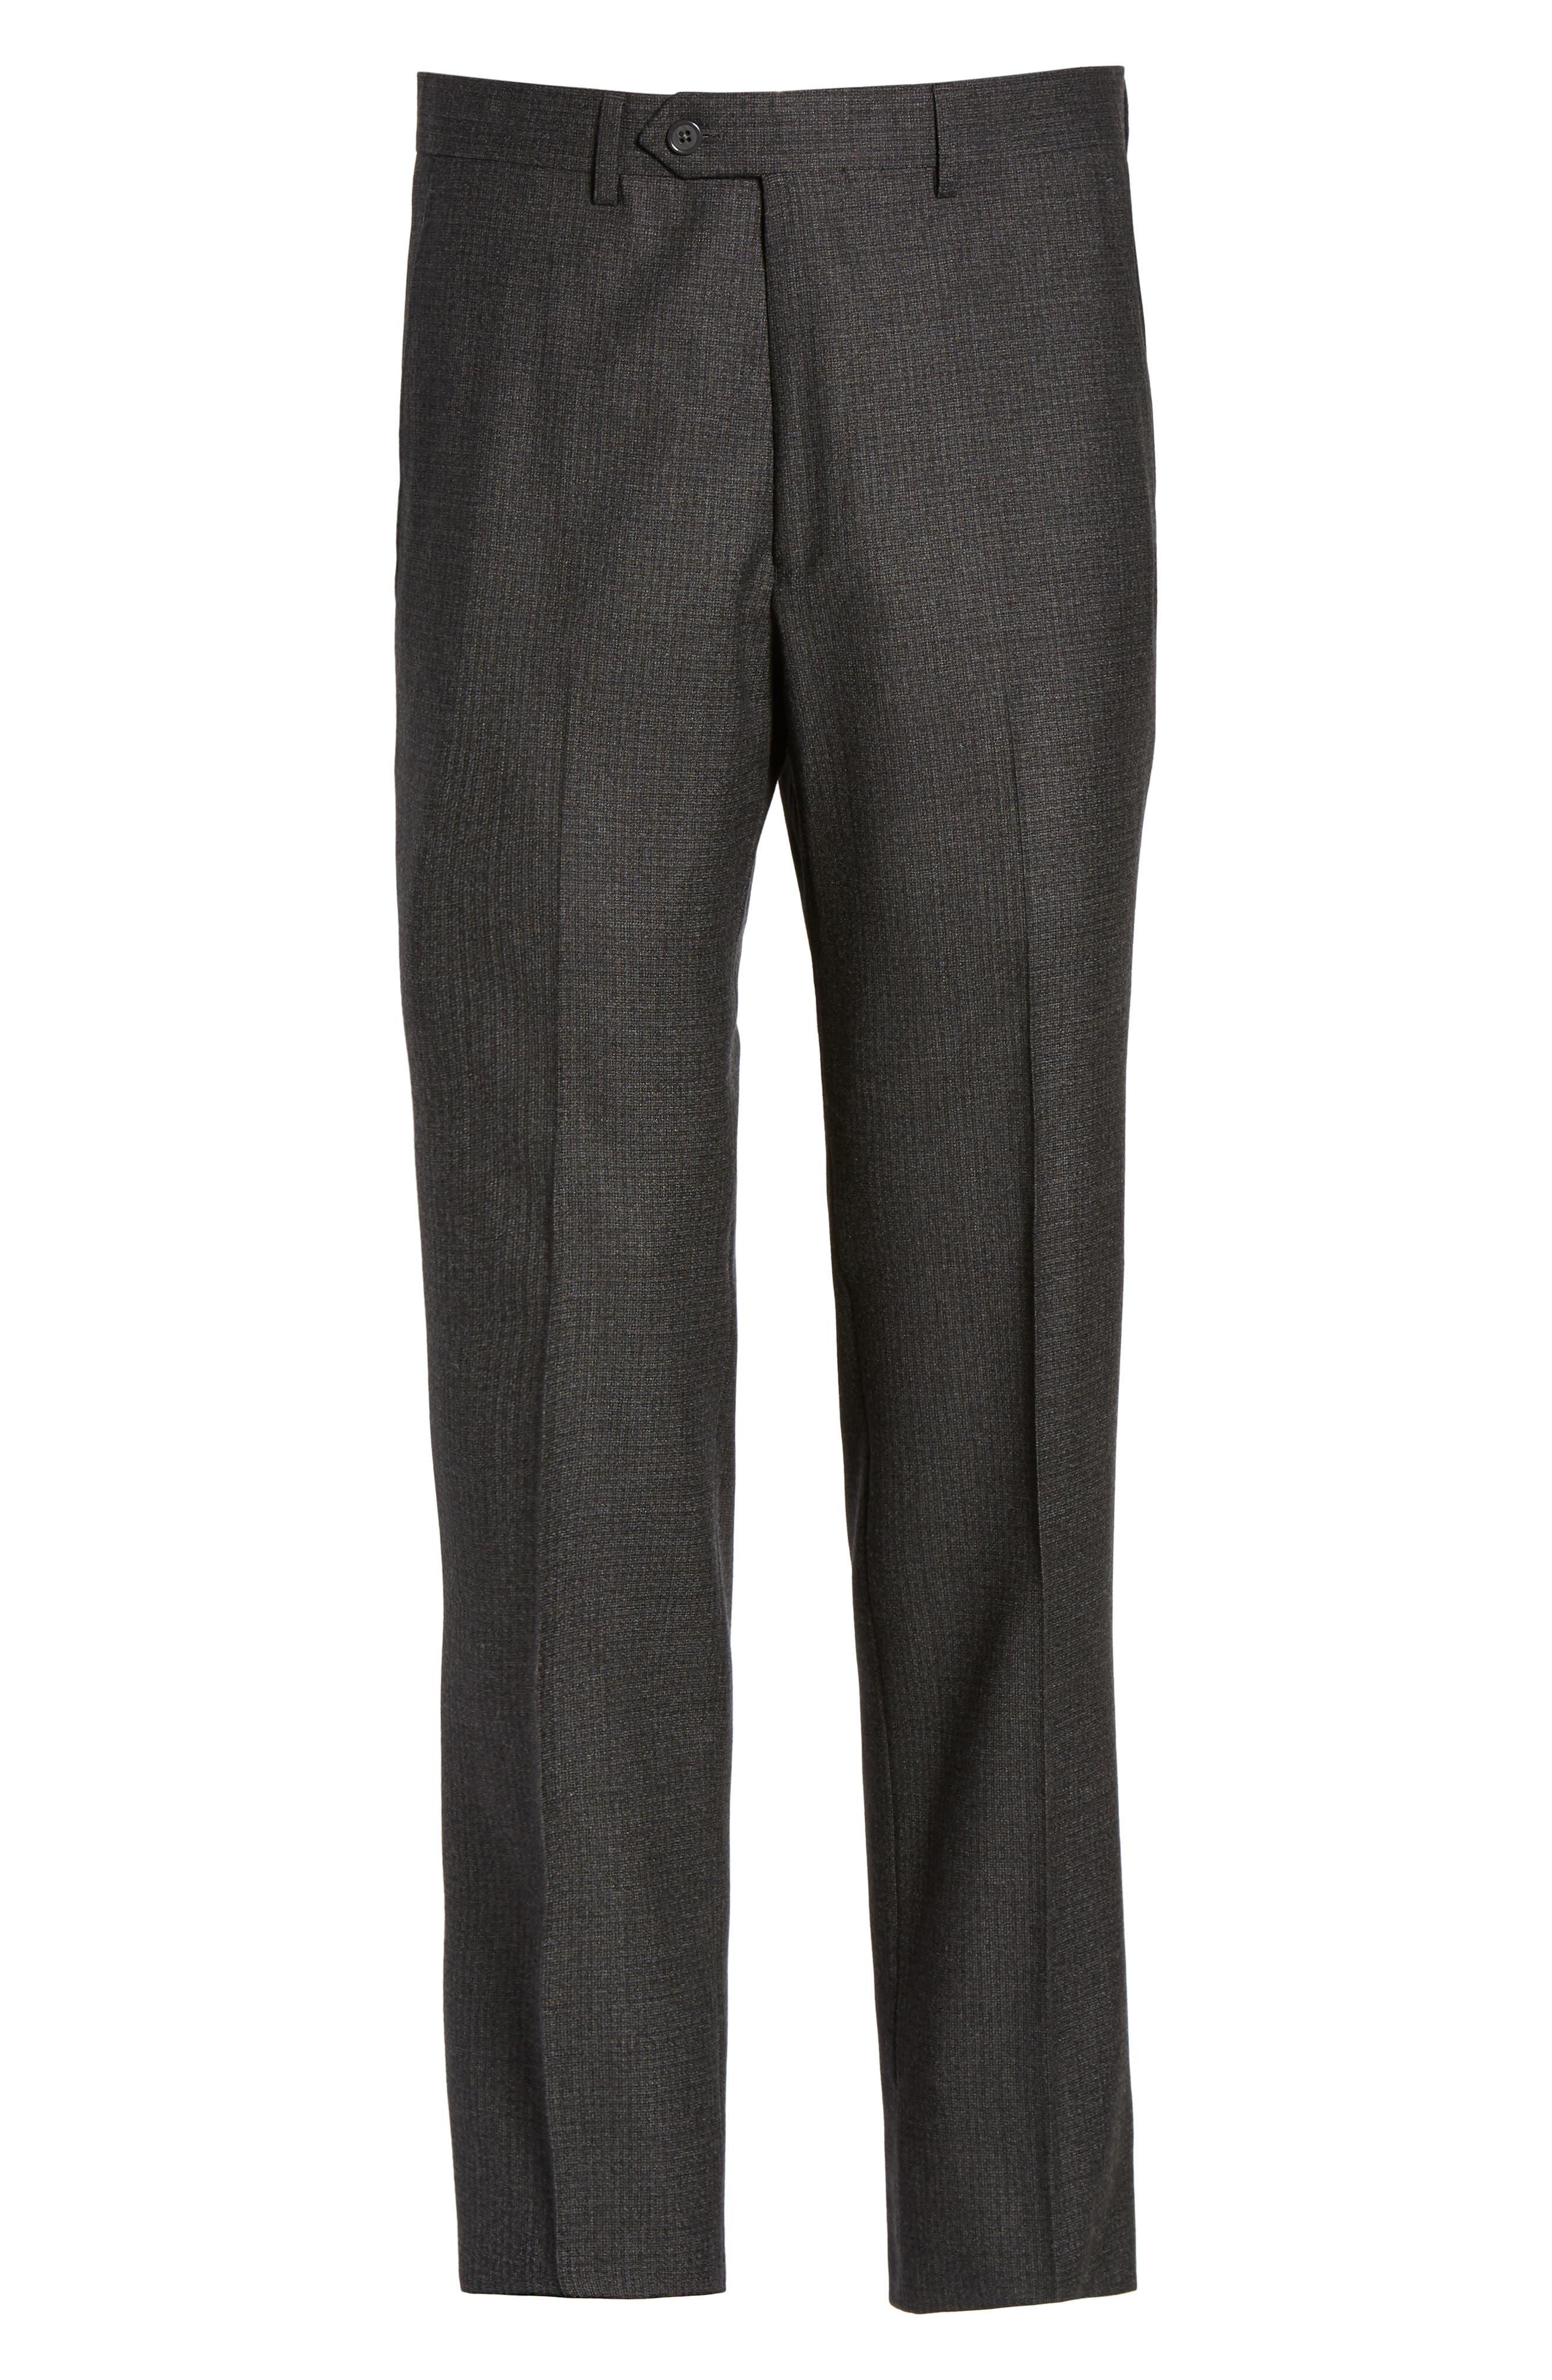 Romero Regular Fit Flat Front Trousers,                             Alternate thumbnail 6, color,                             010